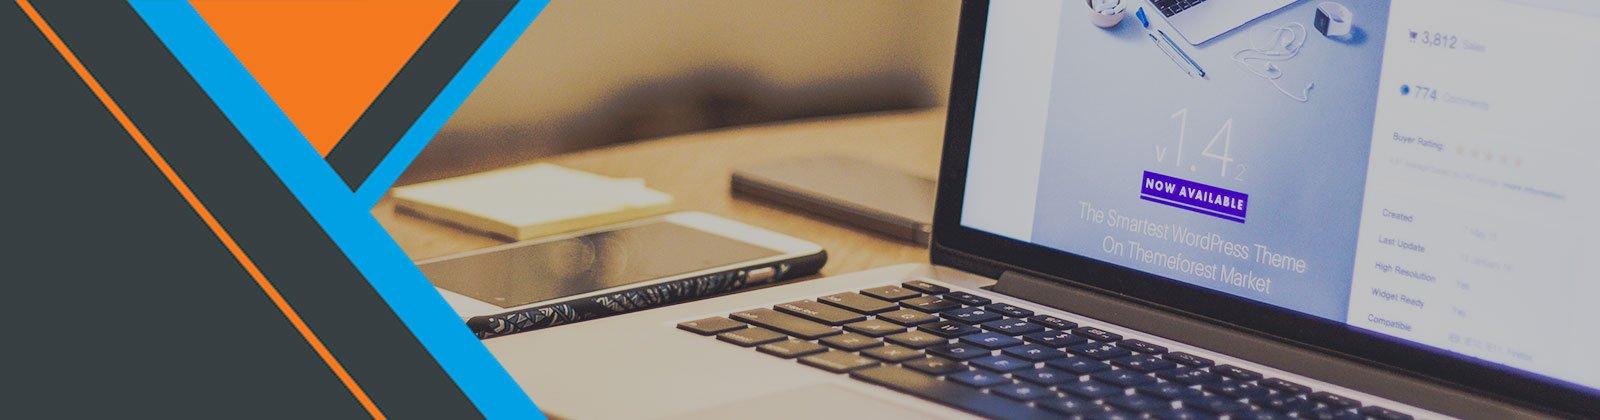 blog-header-template iMac of Macbook upgrade